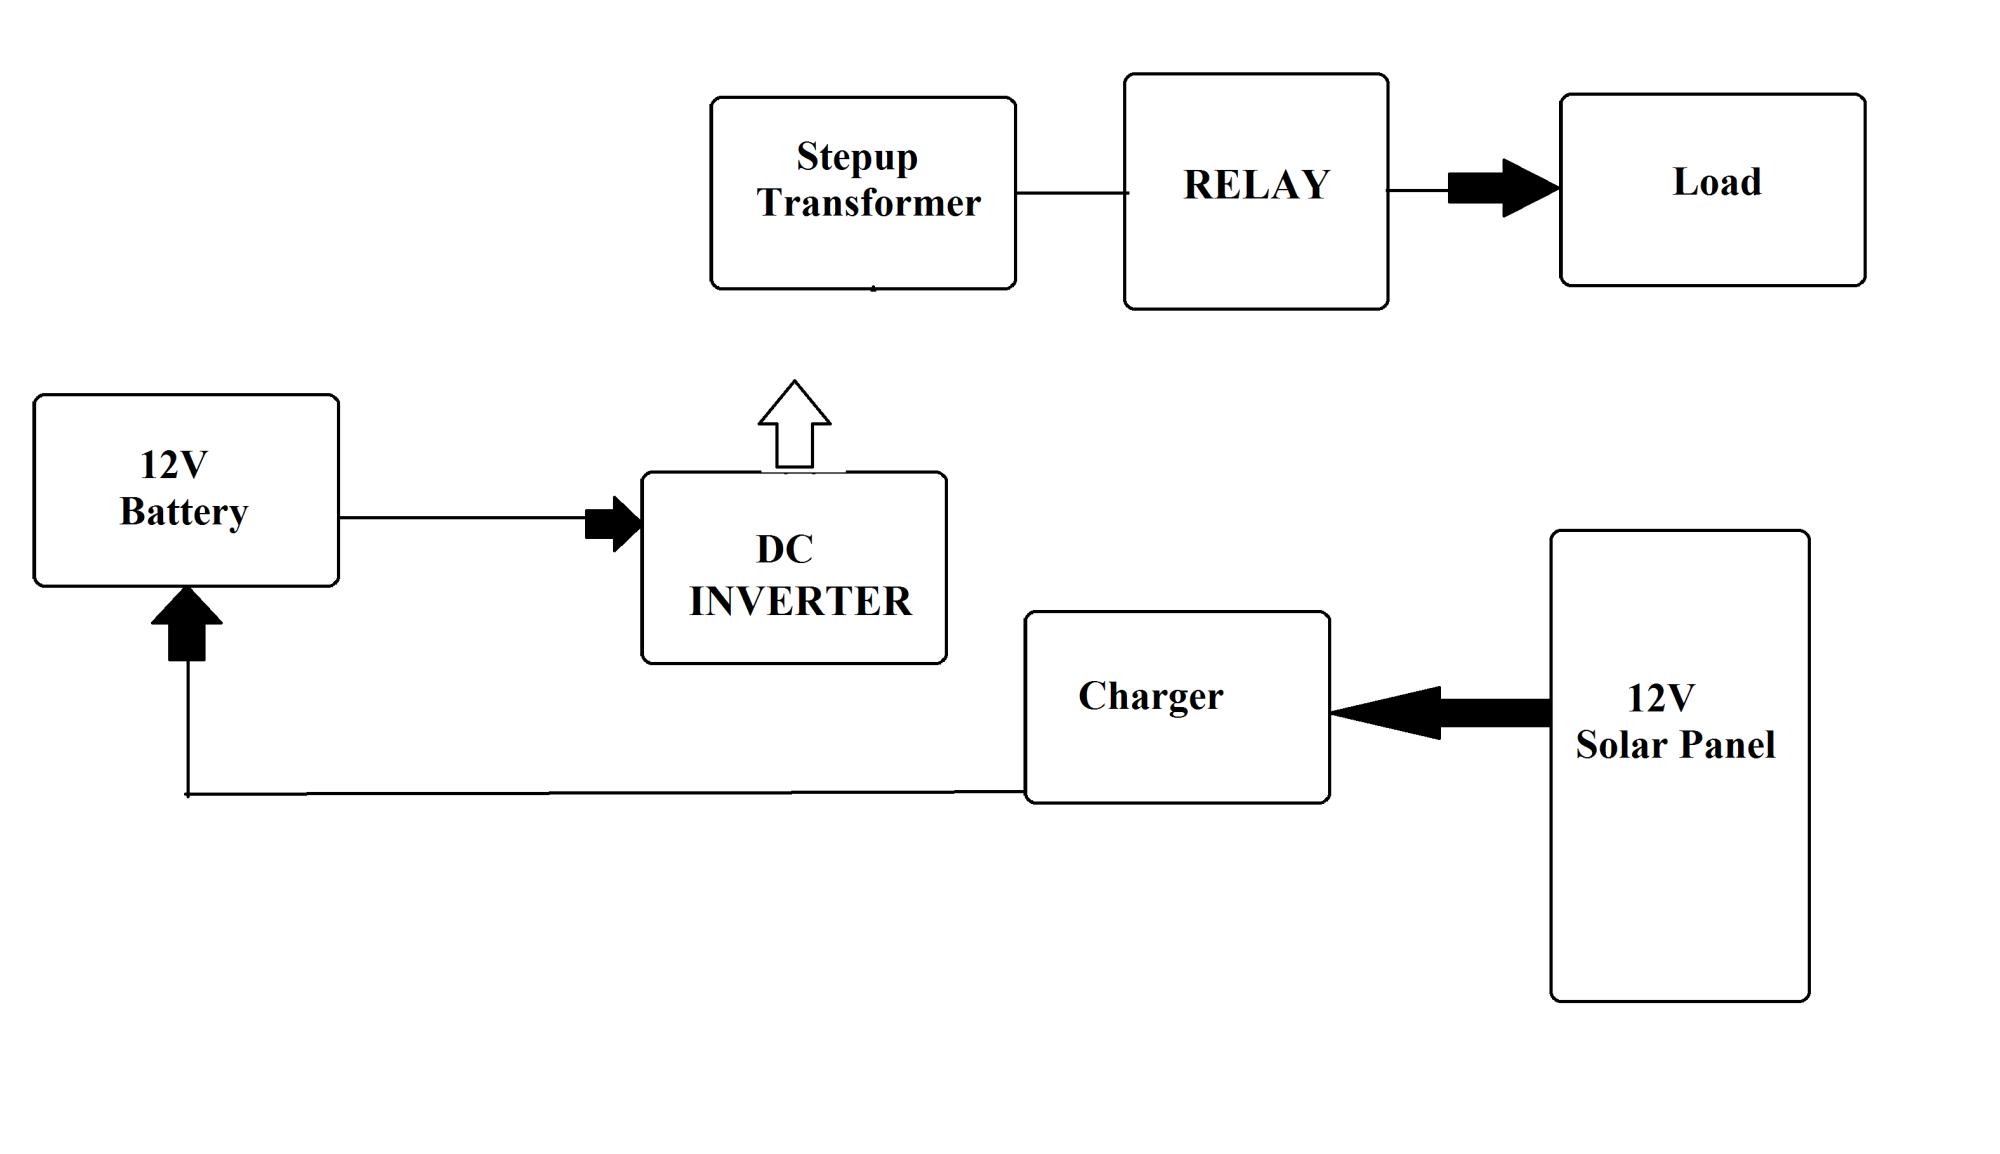 hight resolution of battery block diagram wiring diagram listbattery block diagram wiring diagram go ups battery block diagram battery